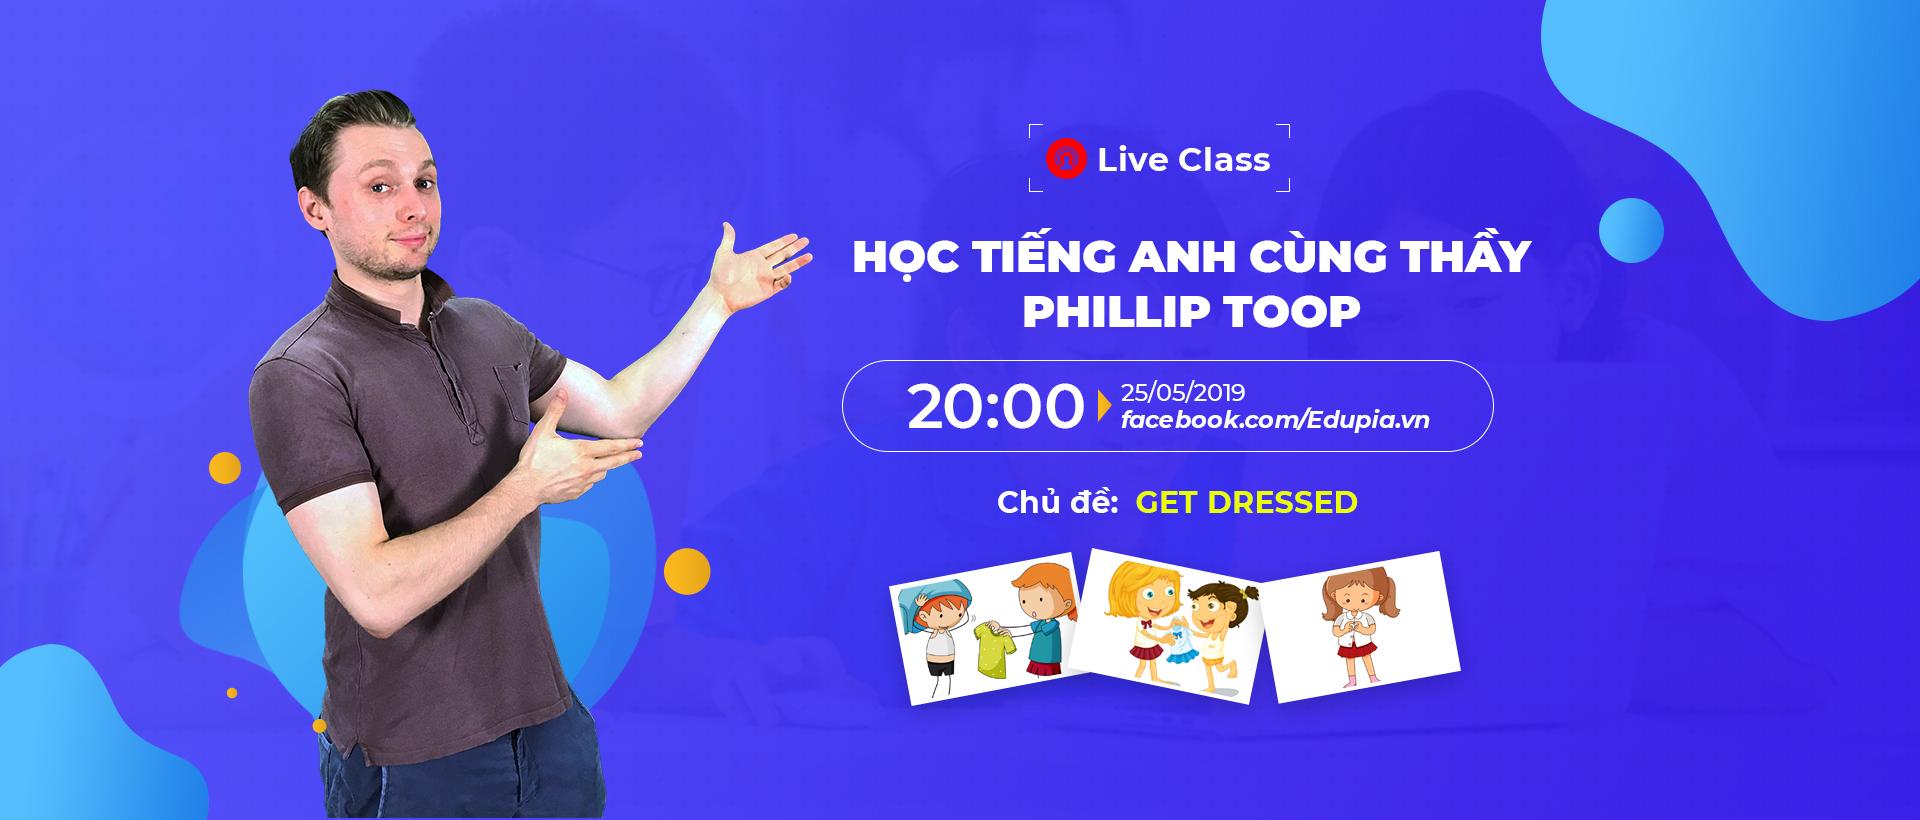 "Live class tuần 5 - CHỦ ĐỀ ""GET DRESSED"""